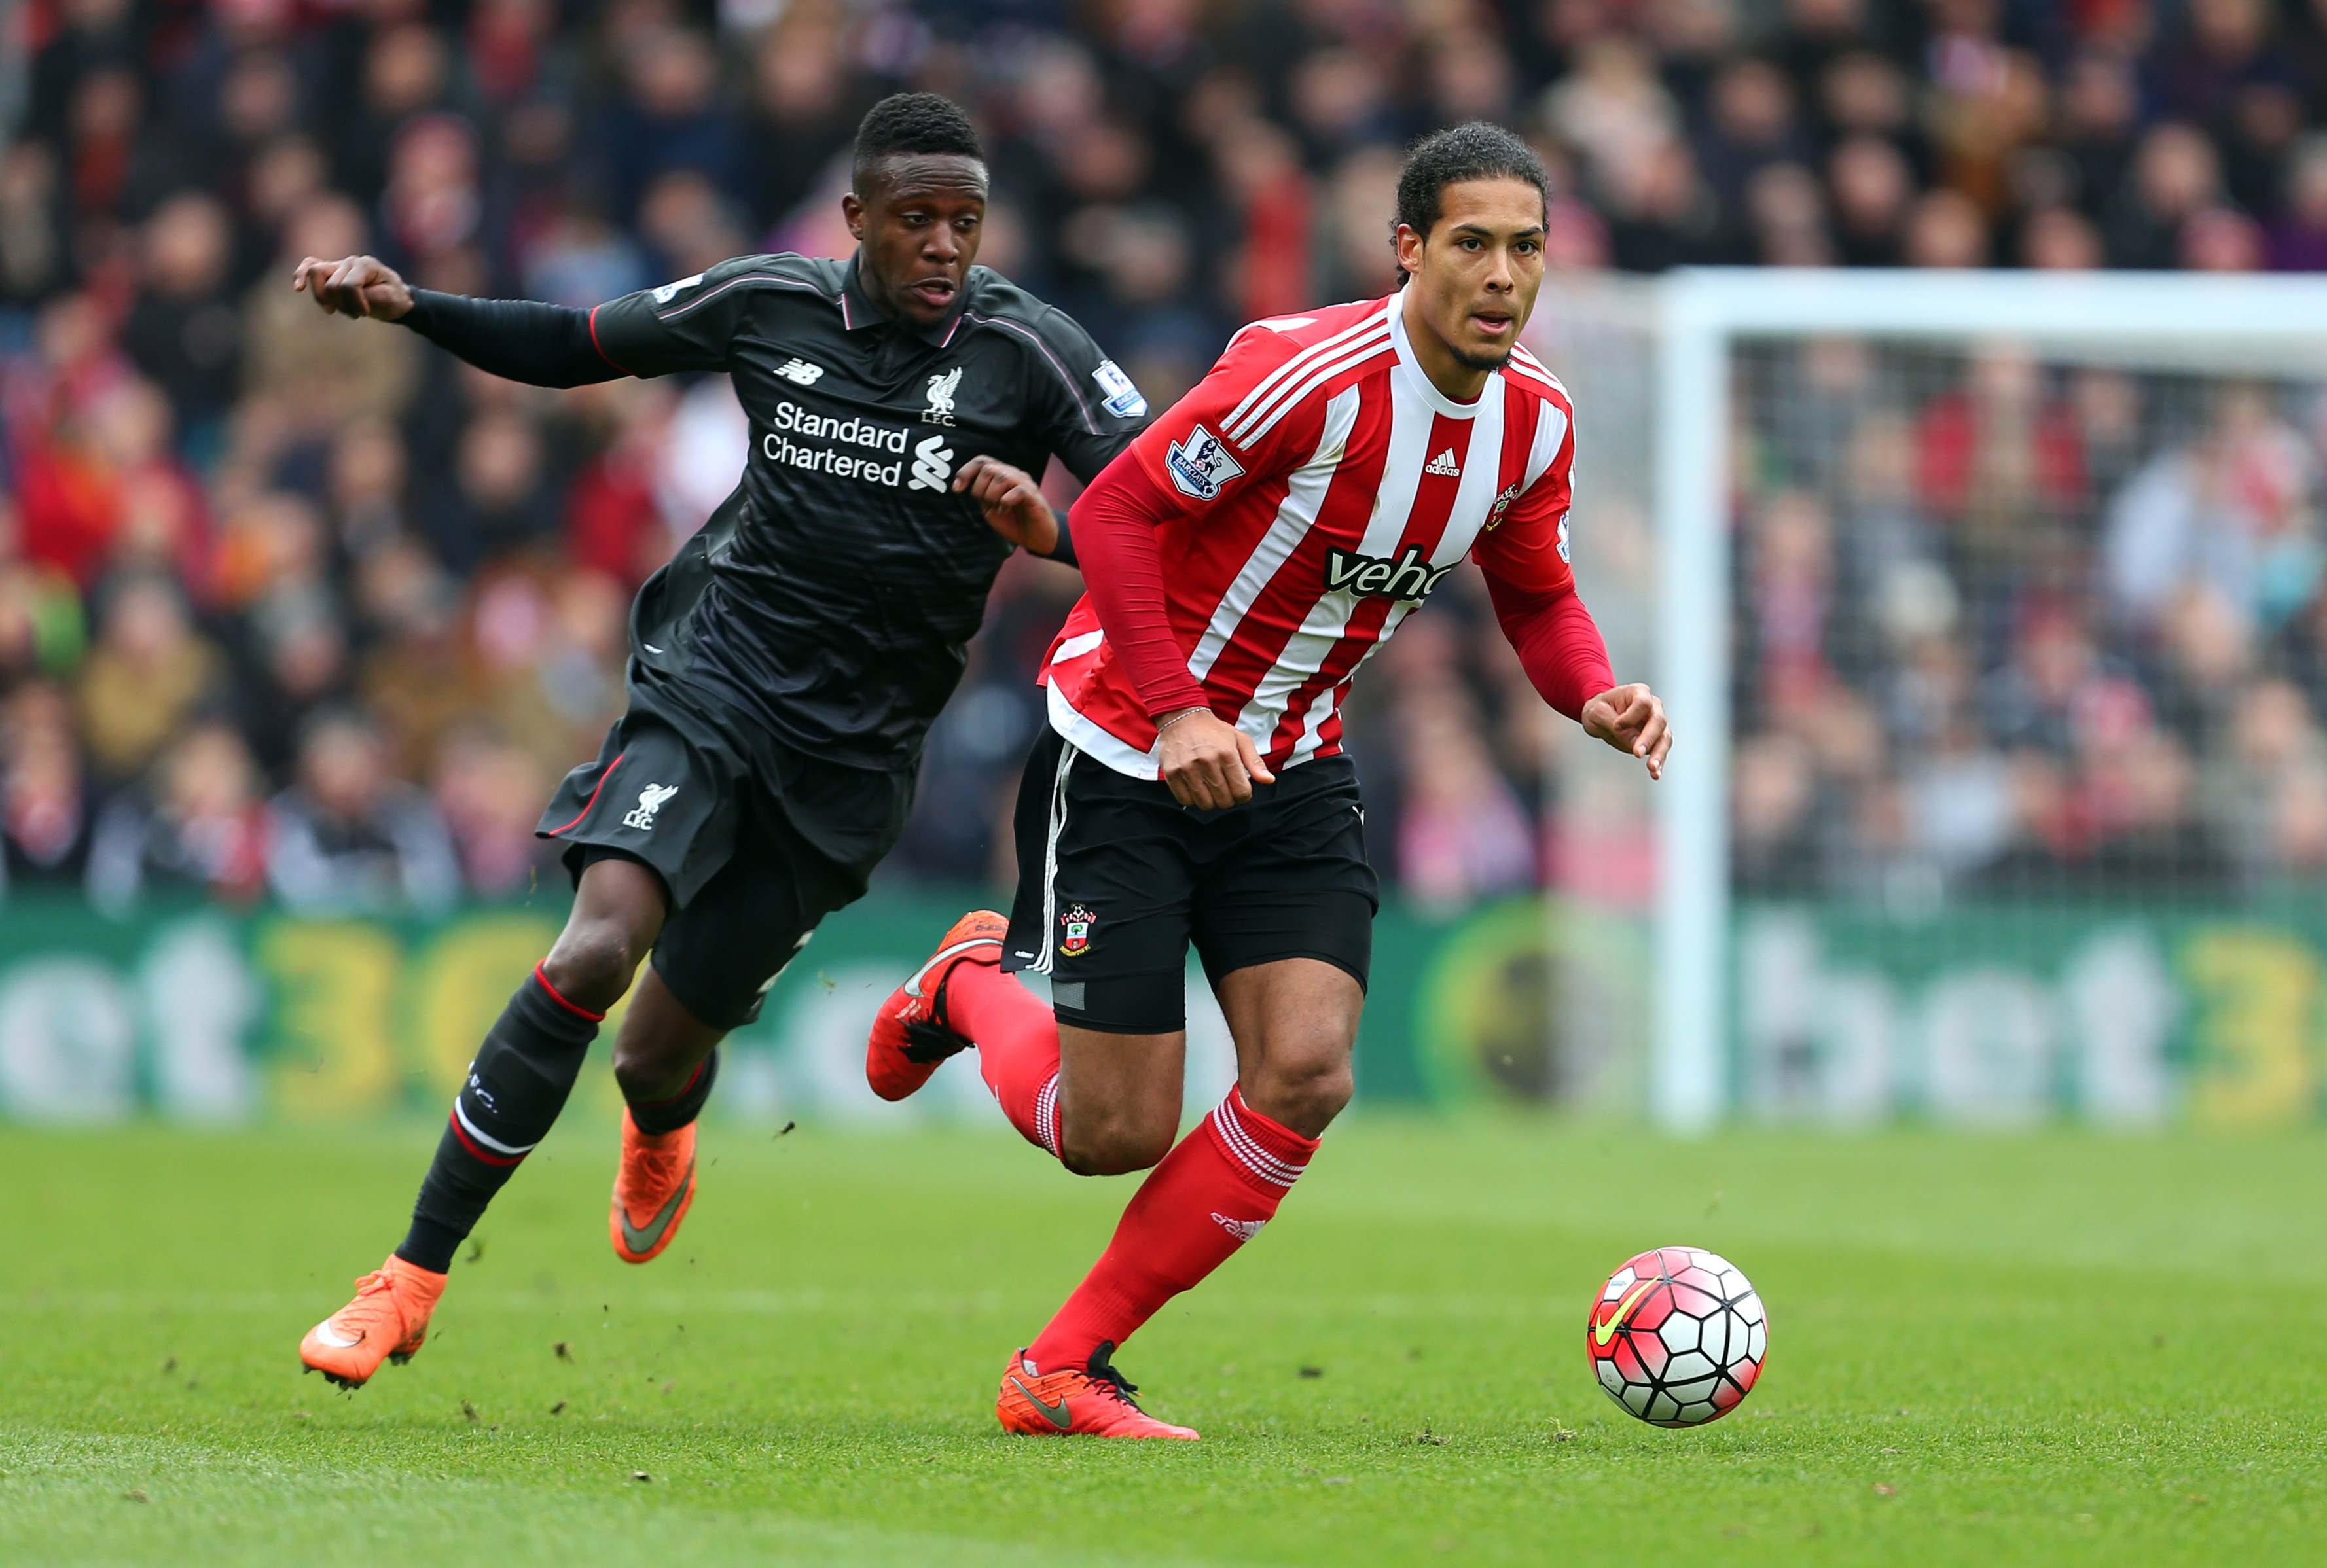 Liverpool transfer target Virgil van Dijk not the answer, set-piece stats suggest